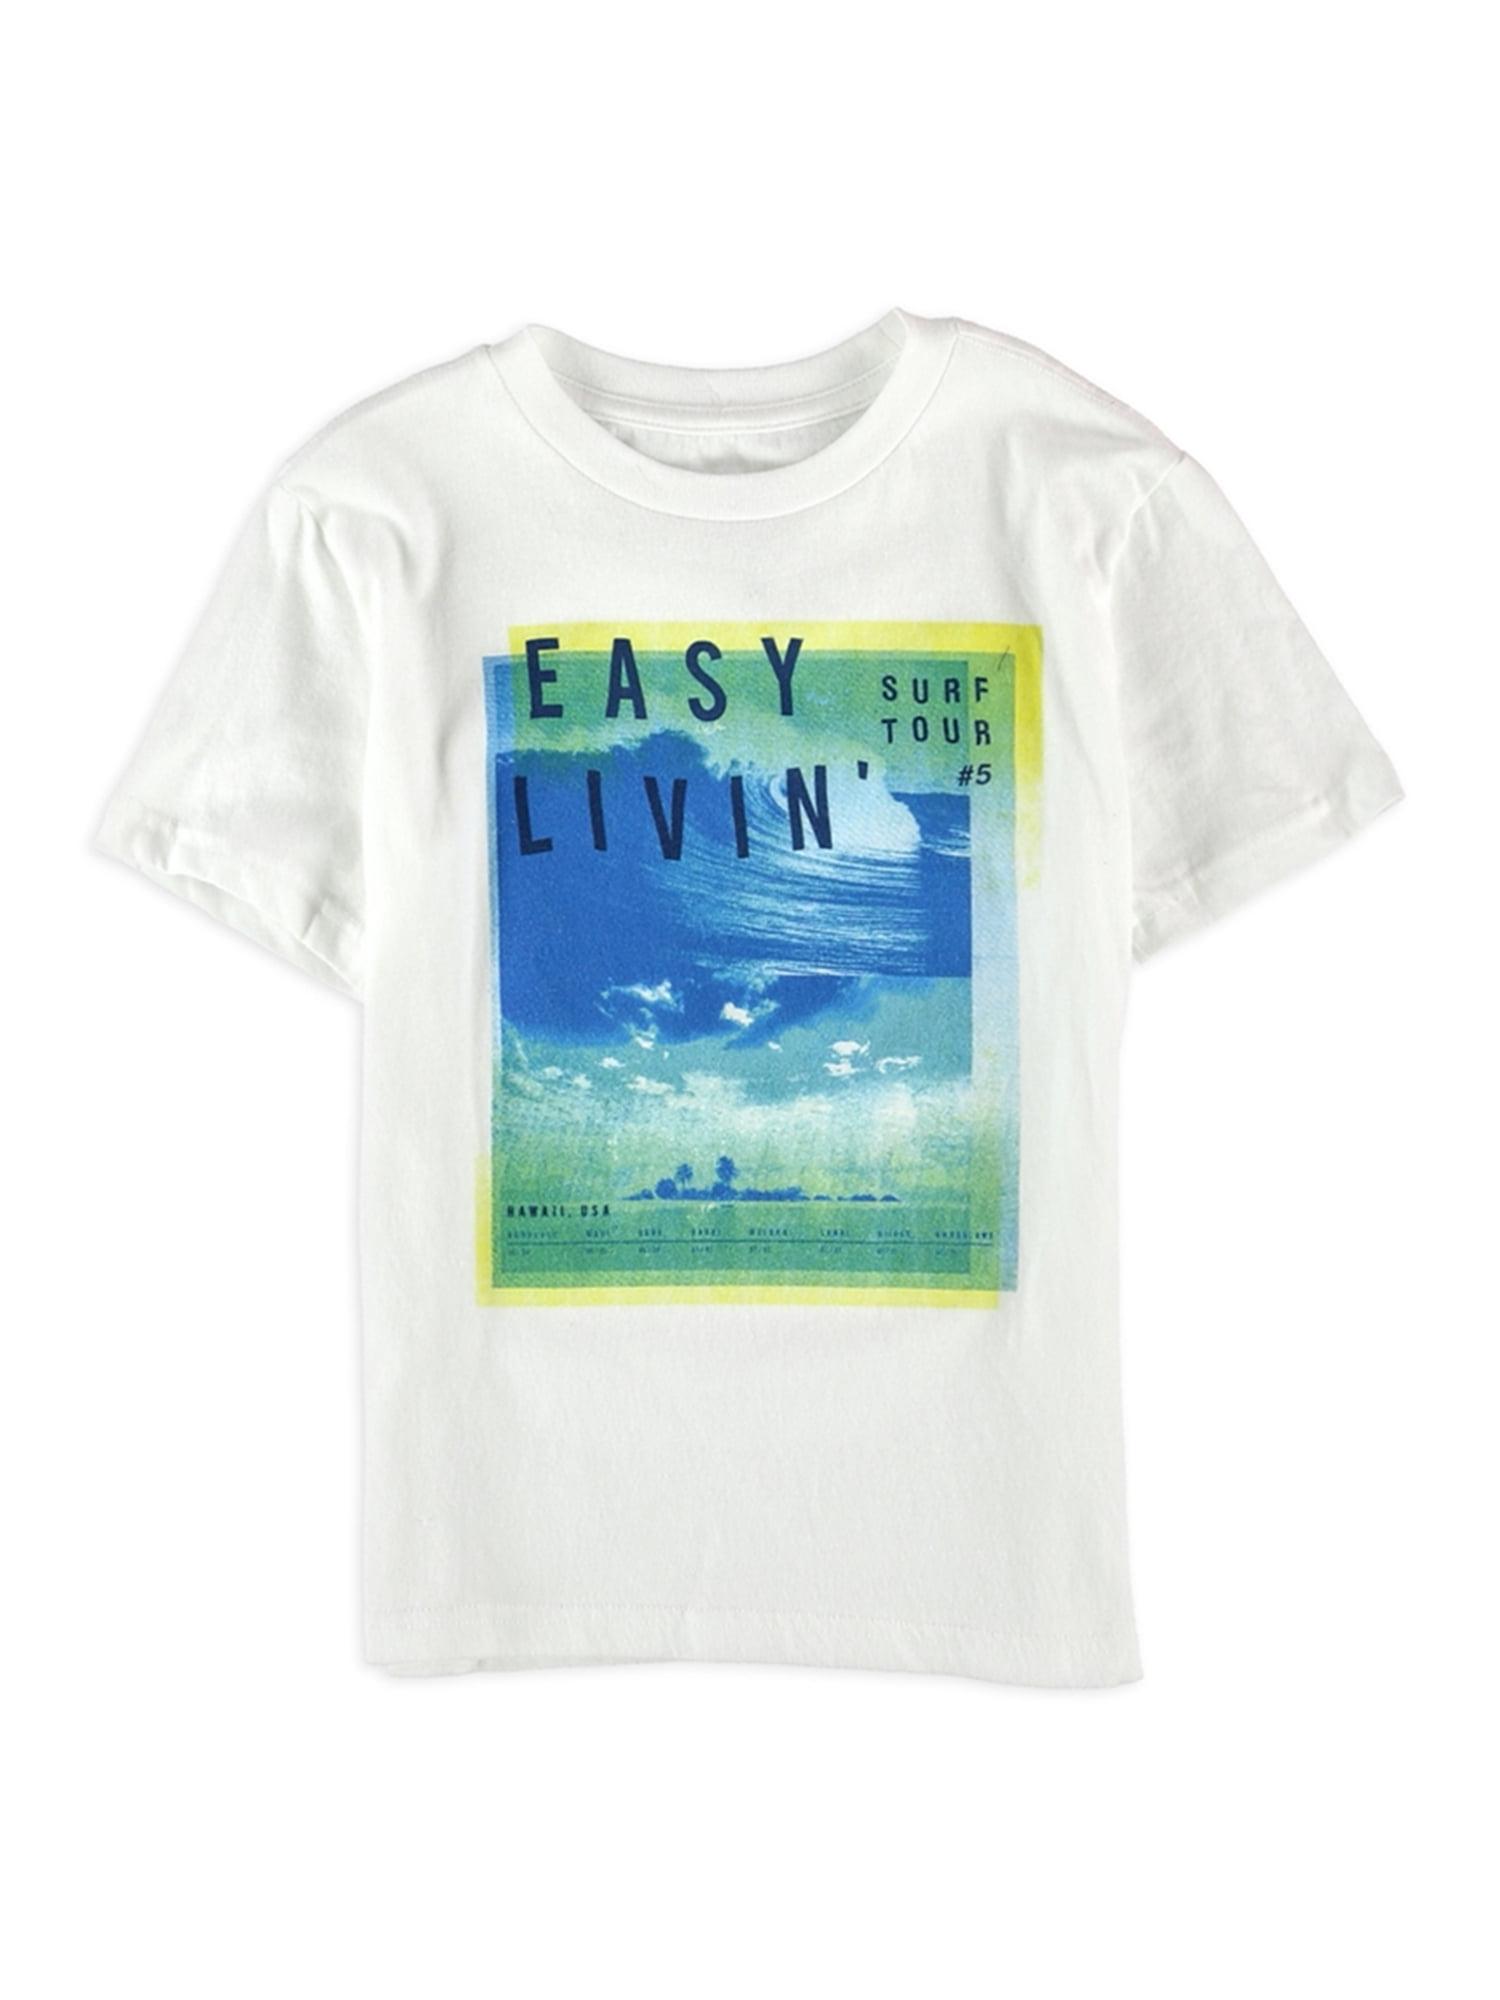 Aeropostale Boys Easy Livin' Graphic T-Shirt 102 Xs - Little Kids (4-7)